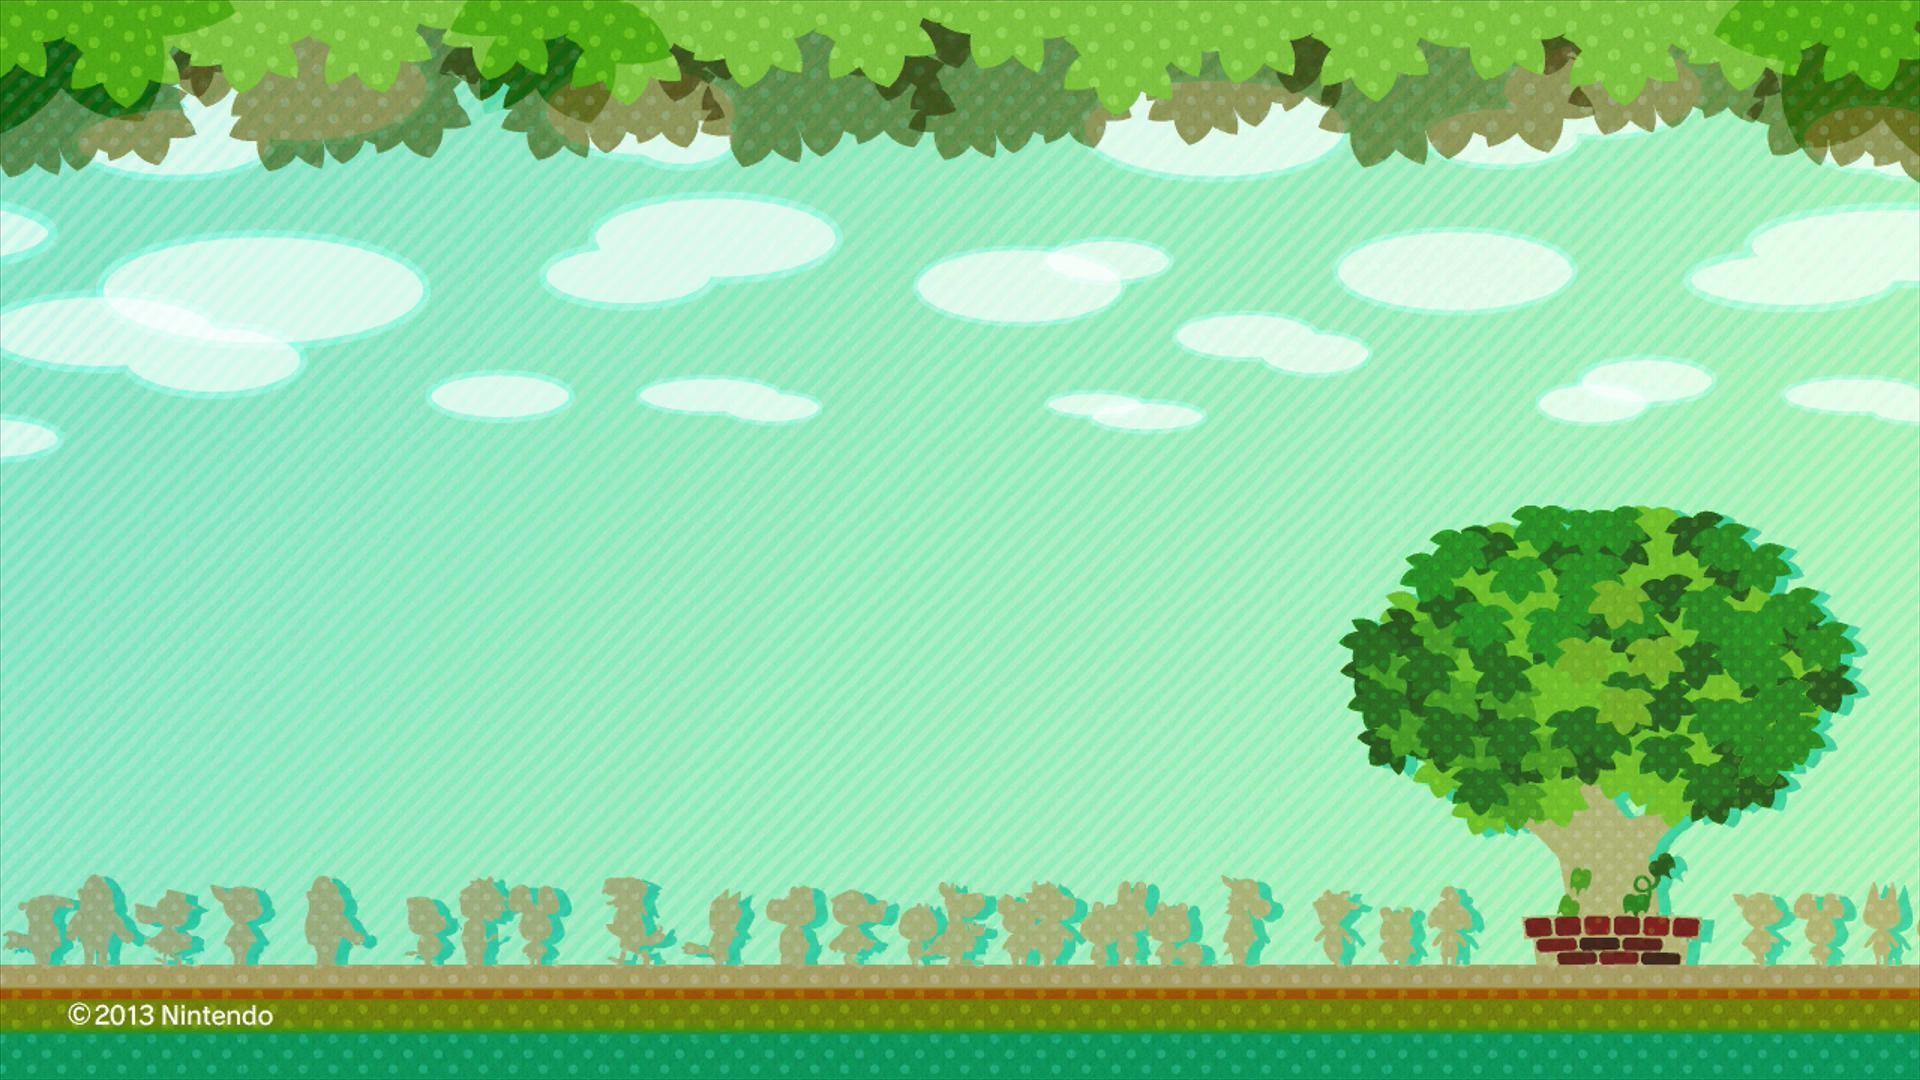 Fall Wallpaper Animal Crossing New Leaf Animal Crossing Iphone Wallpaper 67 Images